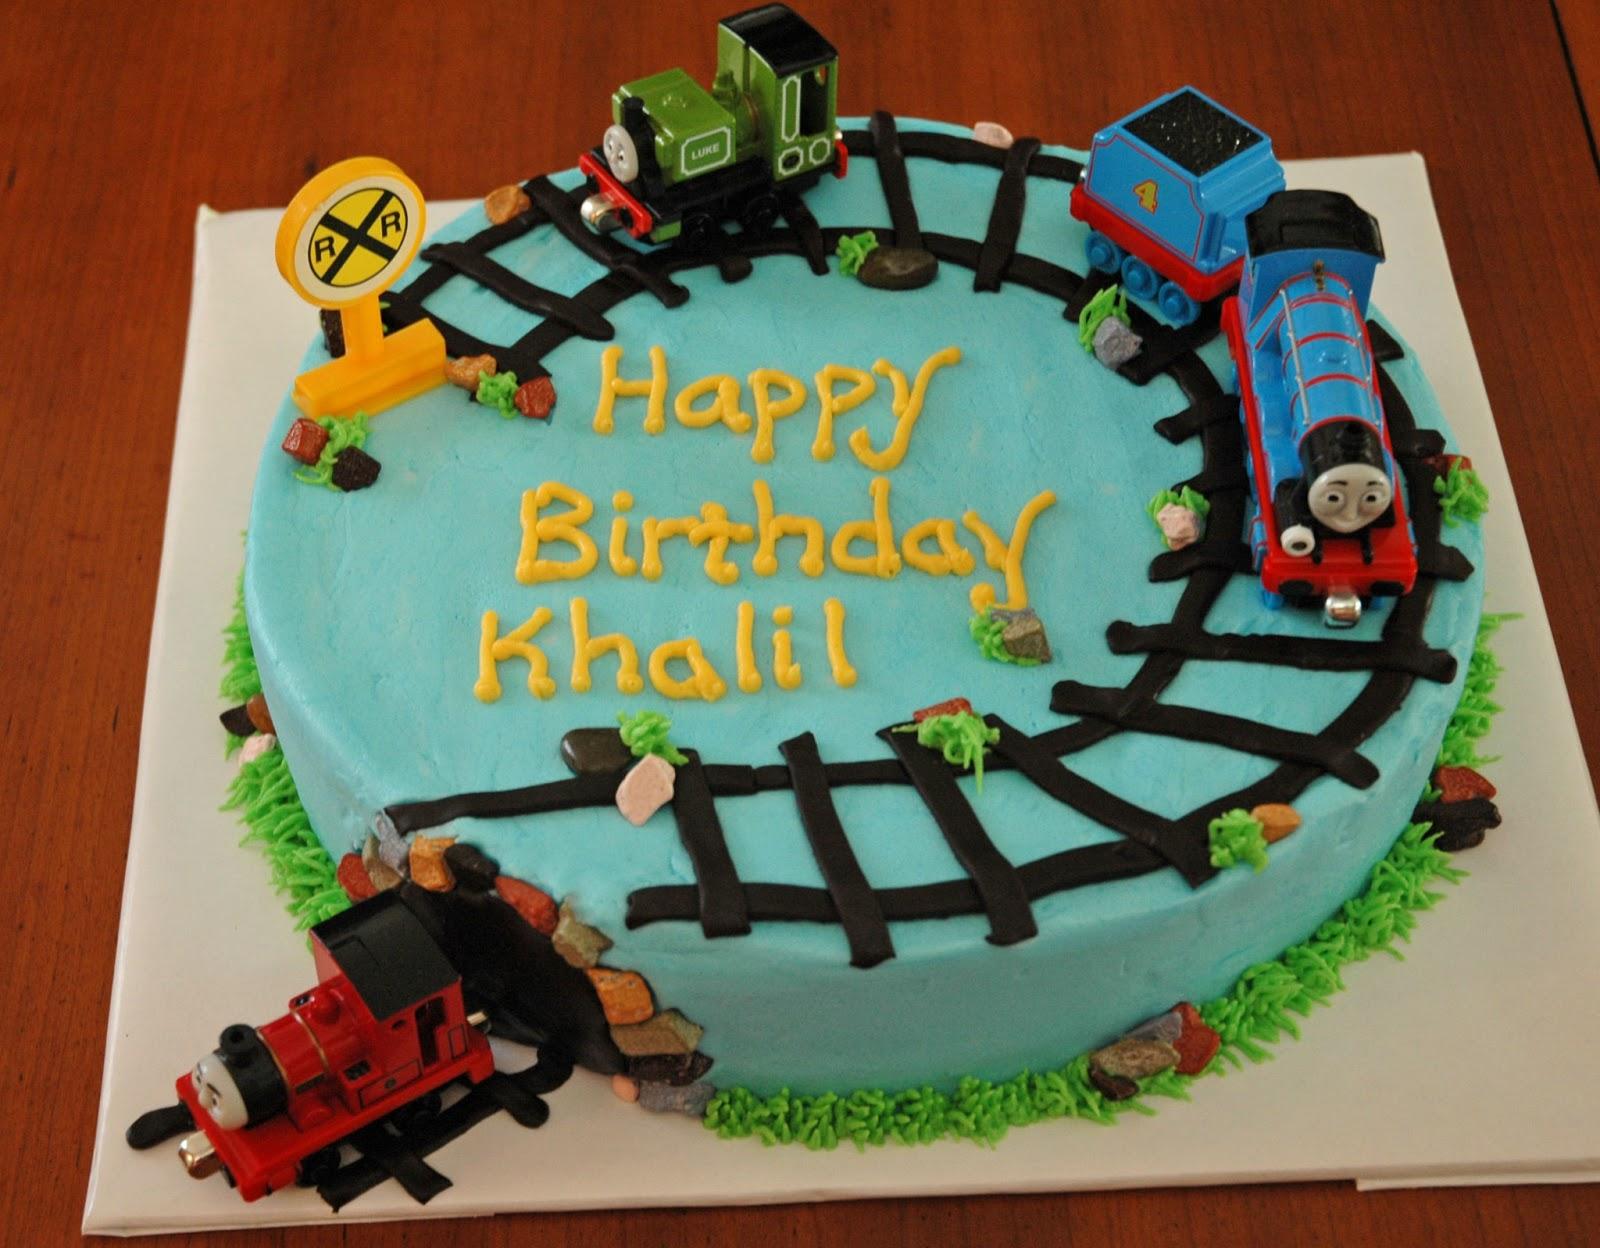 Cheers to many more birthdays watching you grow u0026 eat cake for years to come! Vanilla cake vanilla buttercream icing fondant decorations u0026 toy trains oh ... & CASHu0027S CAKES: Thomas the Train cake CHOO CHOOO!